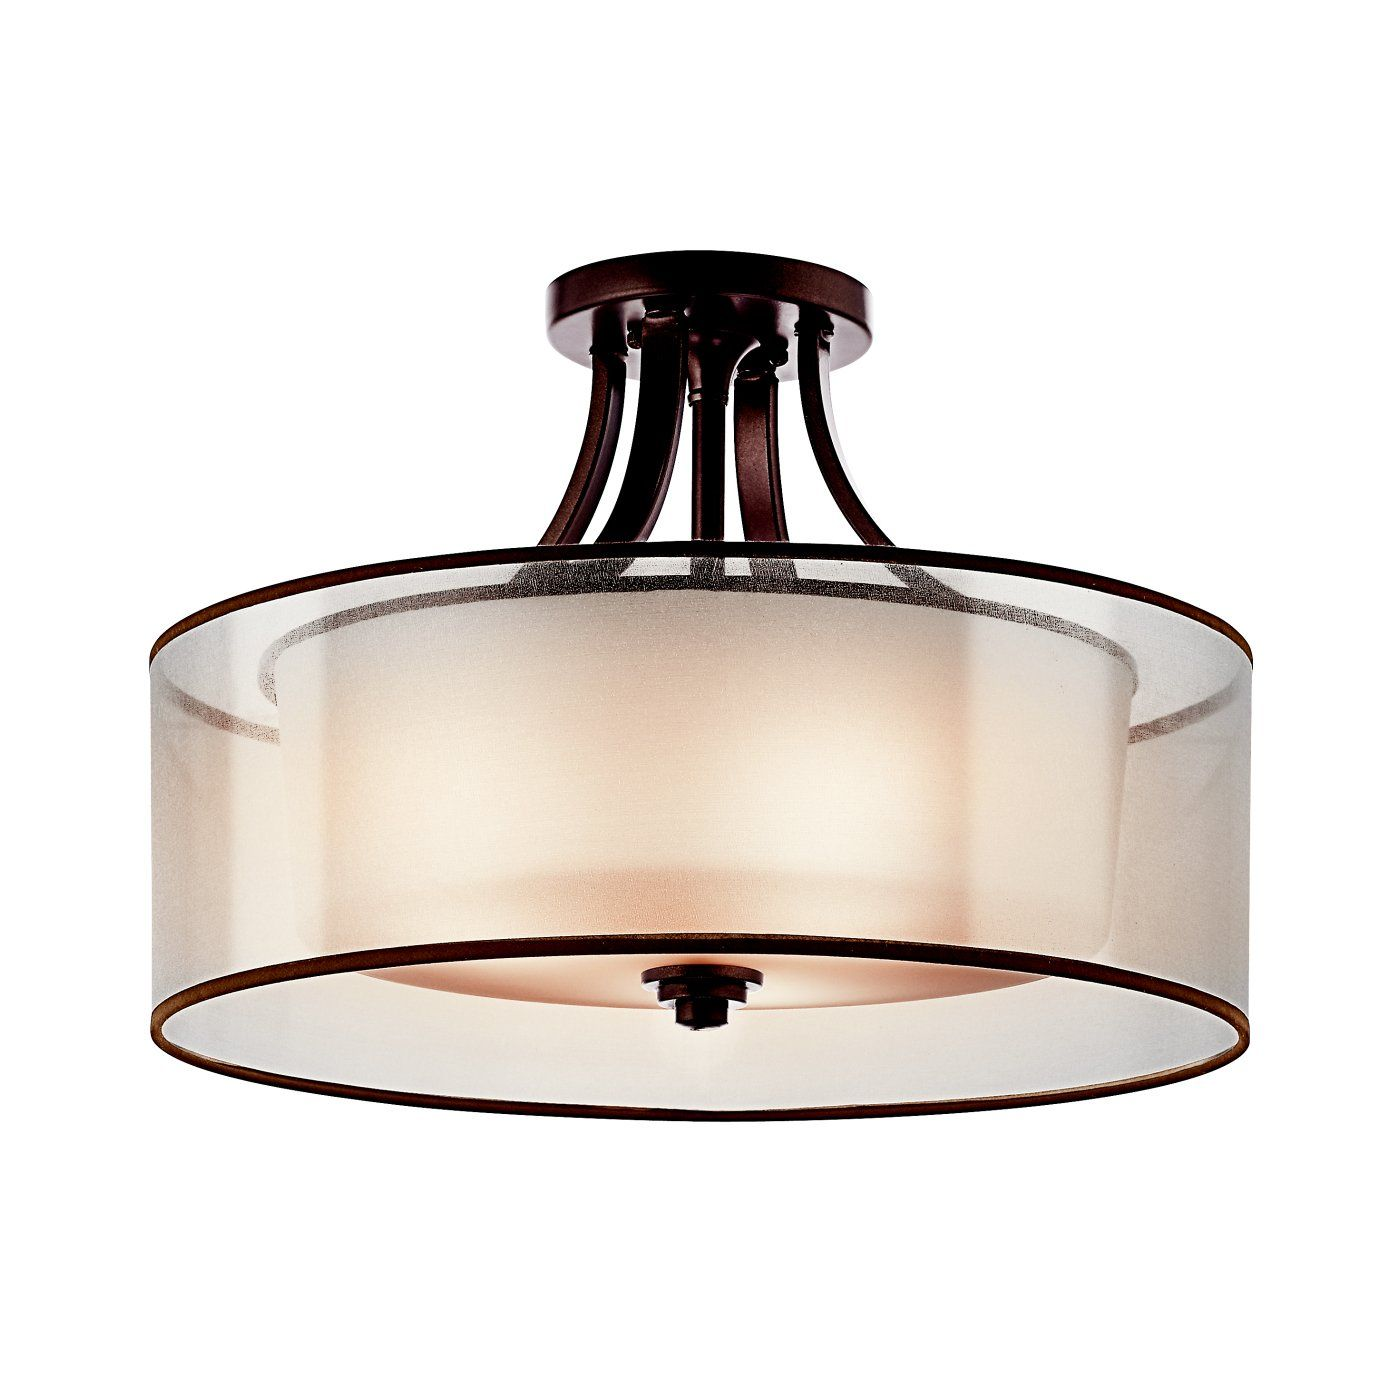 Kichler Lighting 42387 3 Light Lacey Large Semi Flush Ceiling